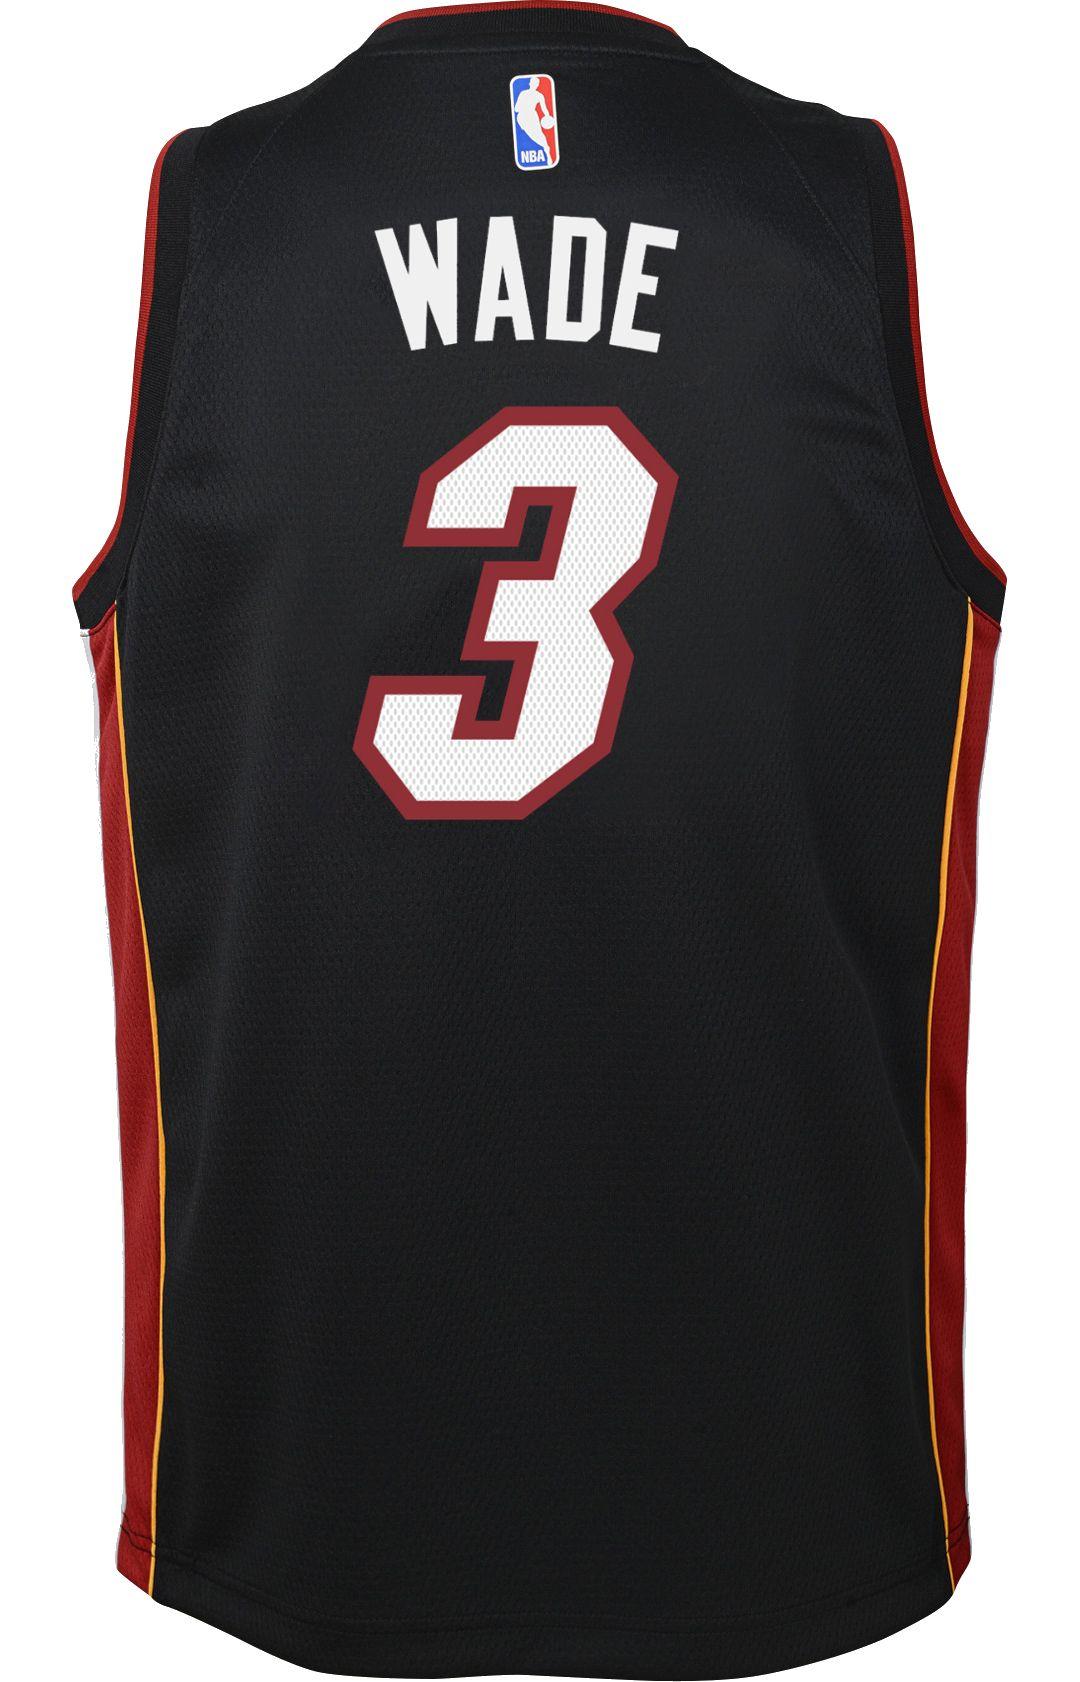 low priced aa762 243c8 Nike Youth Miami Heat Dwyane Wade #3 Black Dri-FIT Swingman Jersey